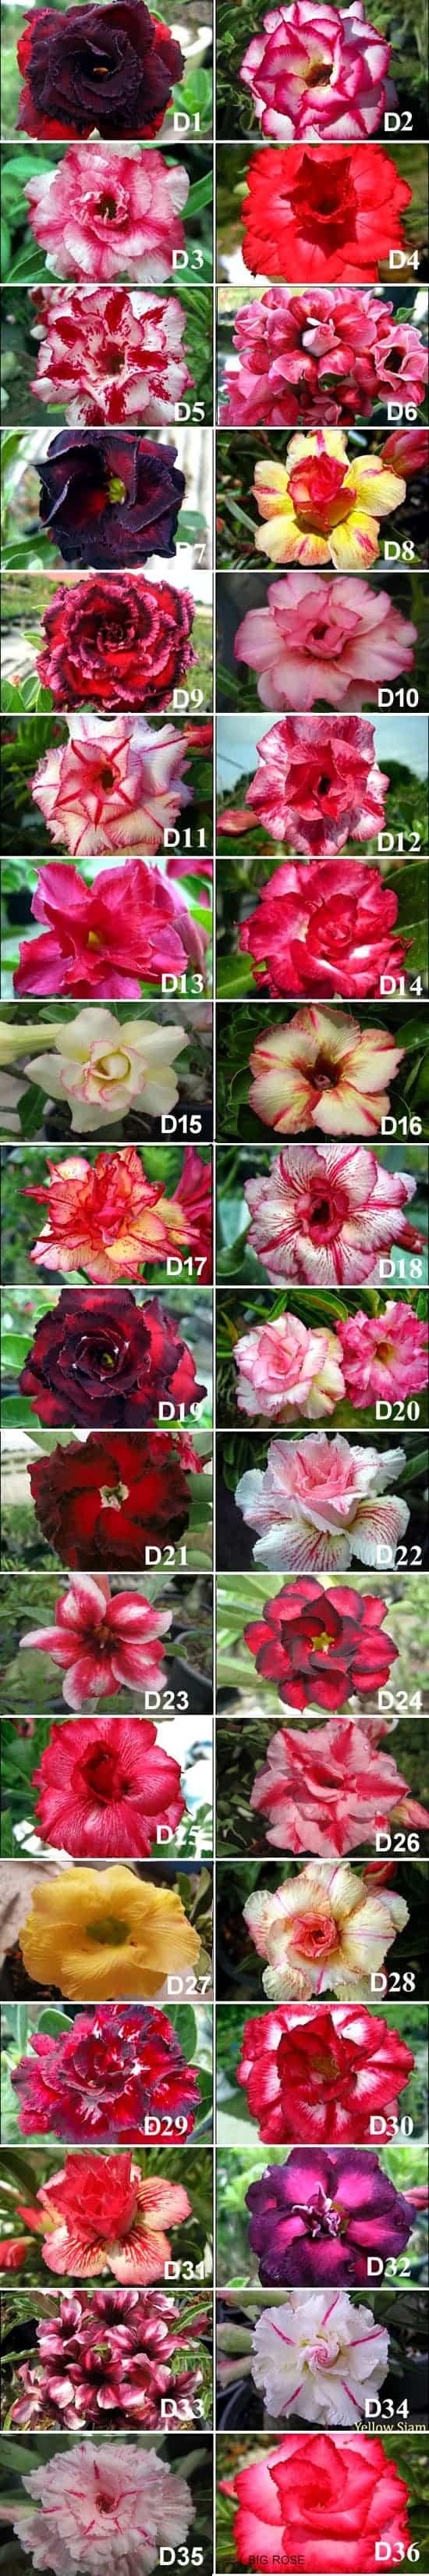 Adenium new flower set D